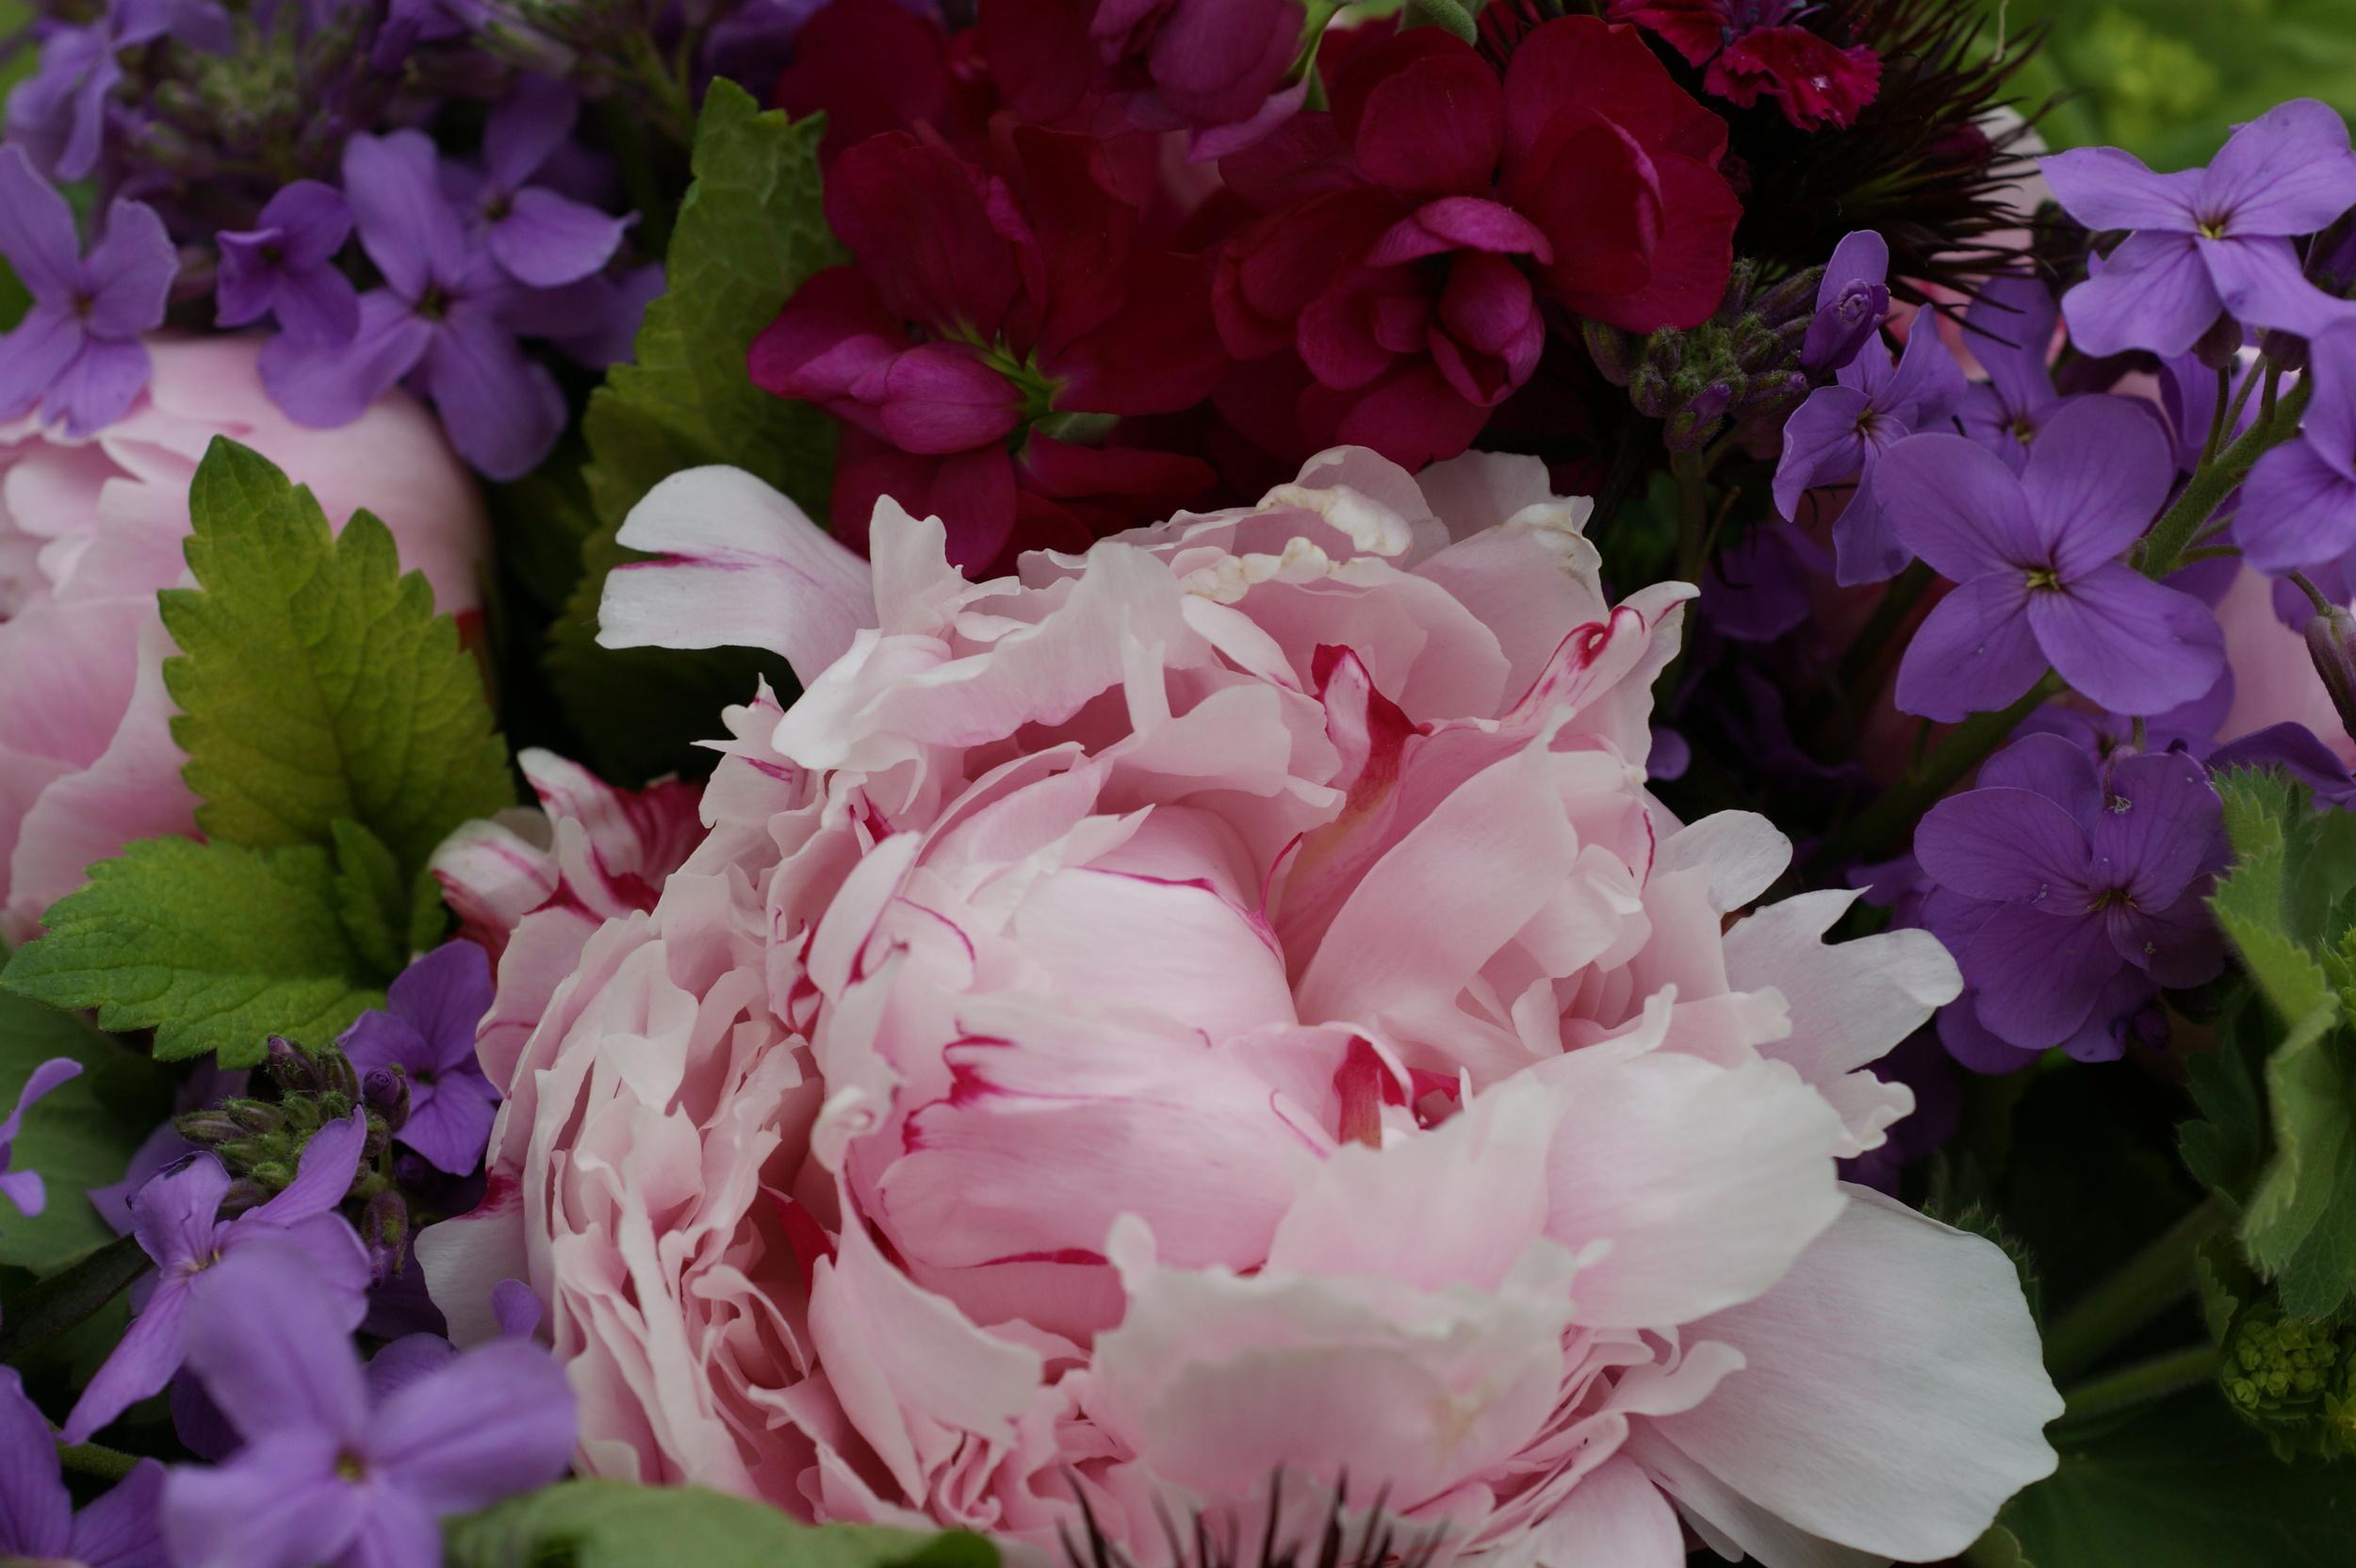 garden and floristry 1 427.JPG